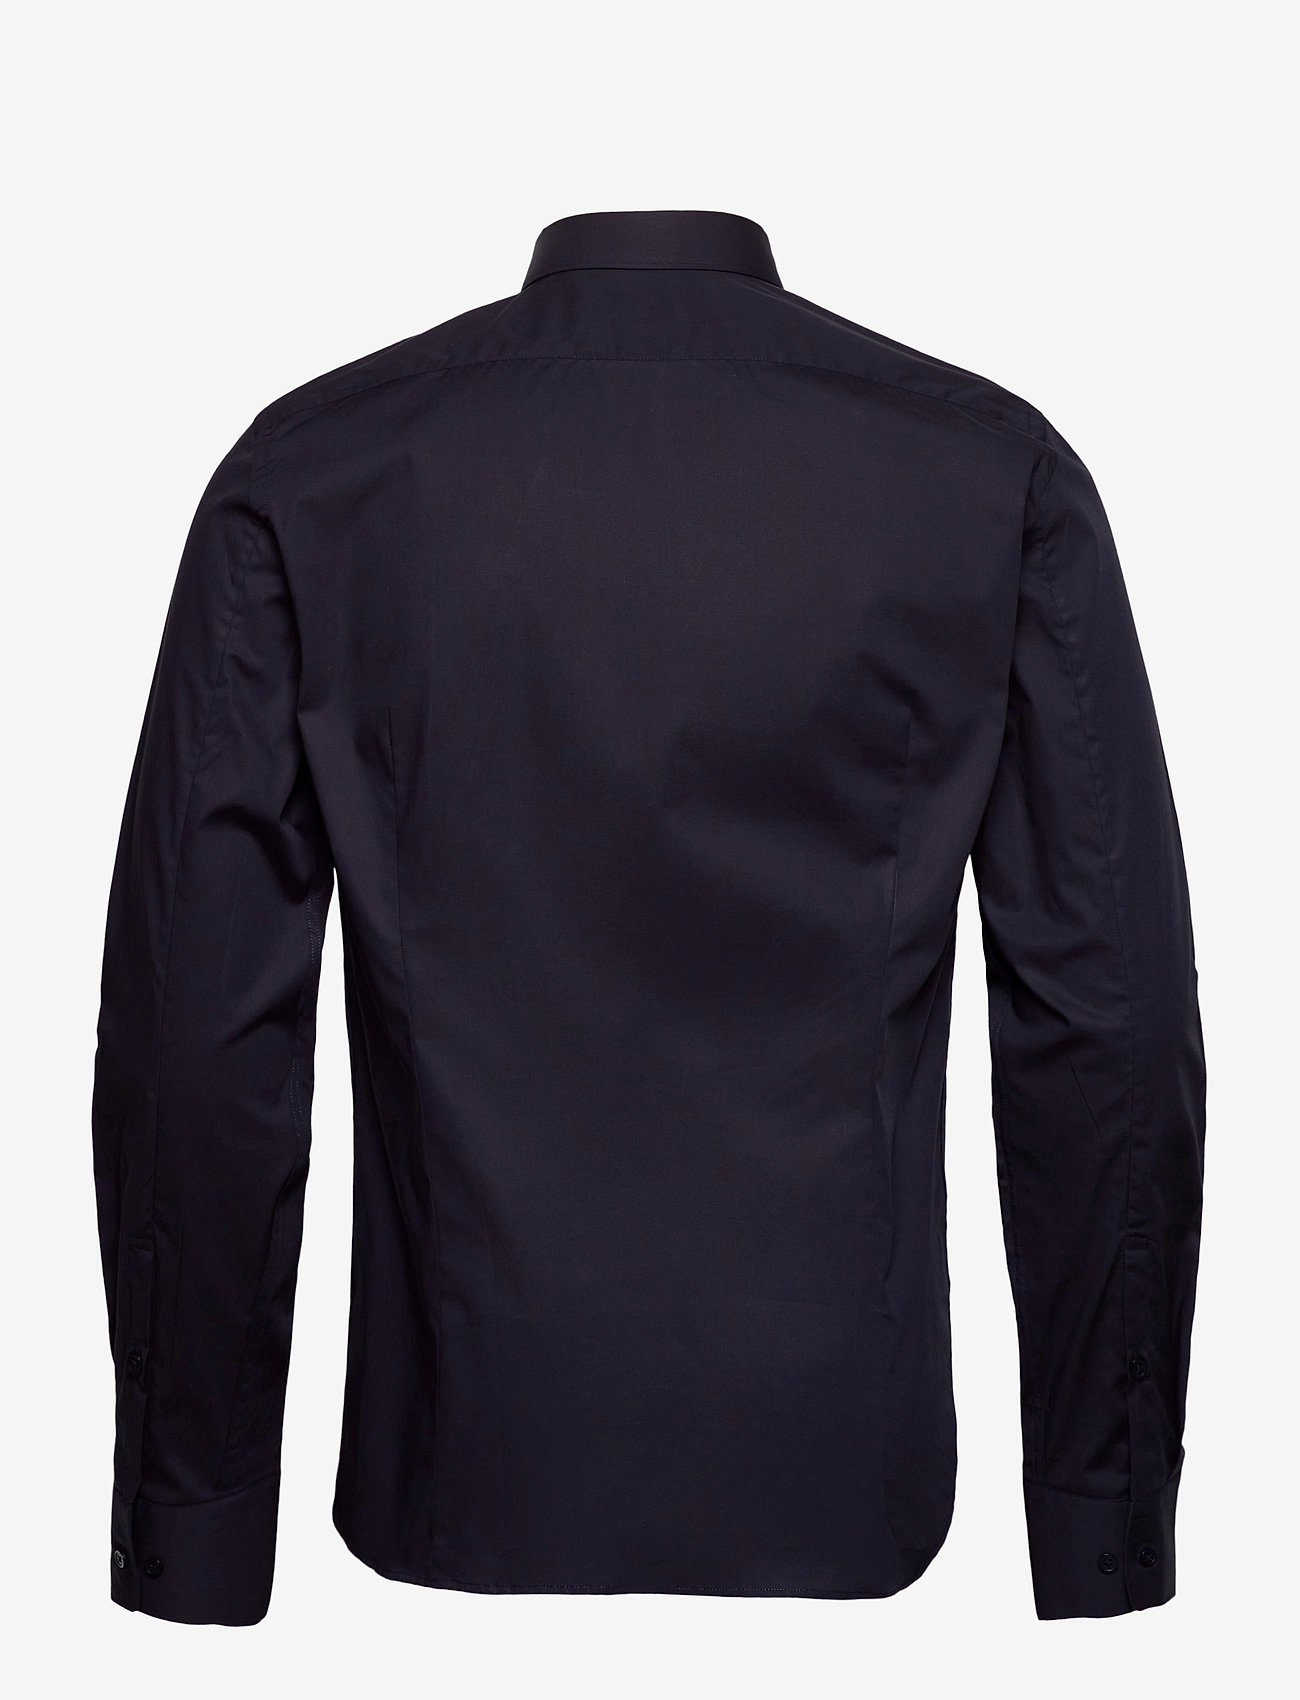 Filippa K M. Paul Stretch Shirt - Skjorter NAVY - Menn Klær